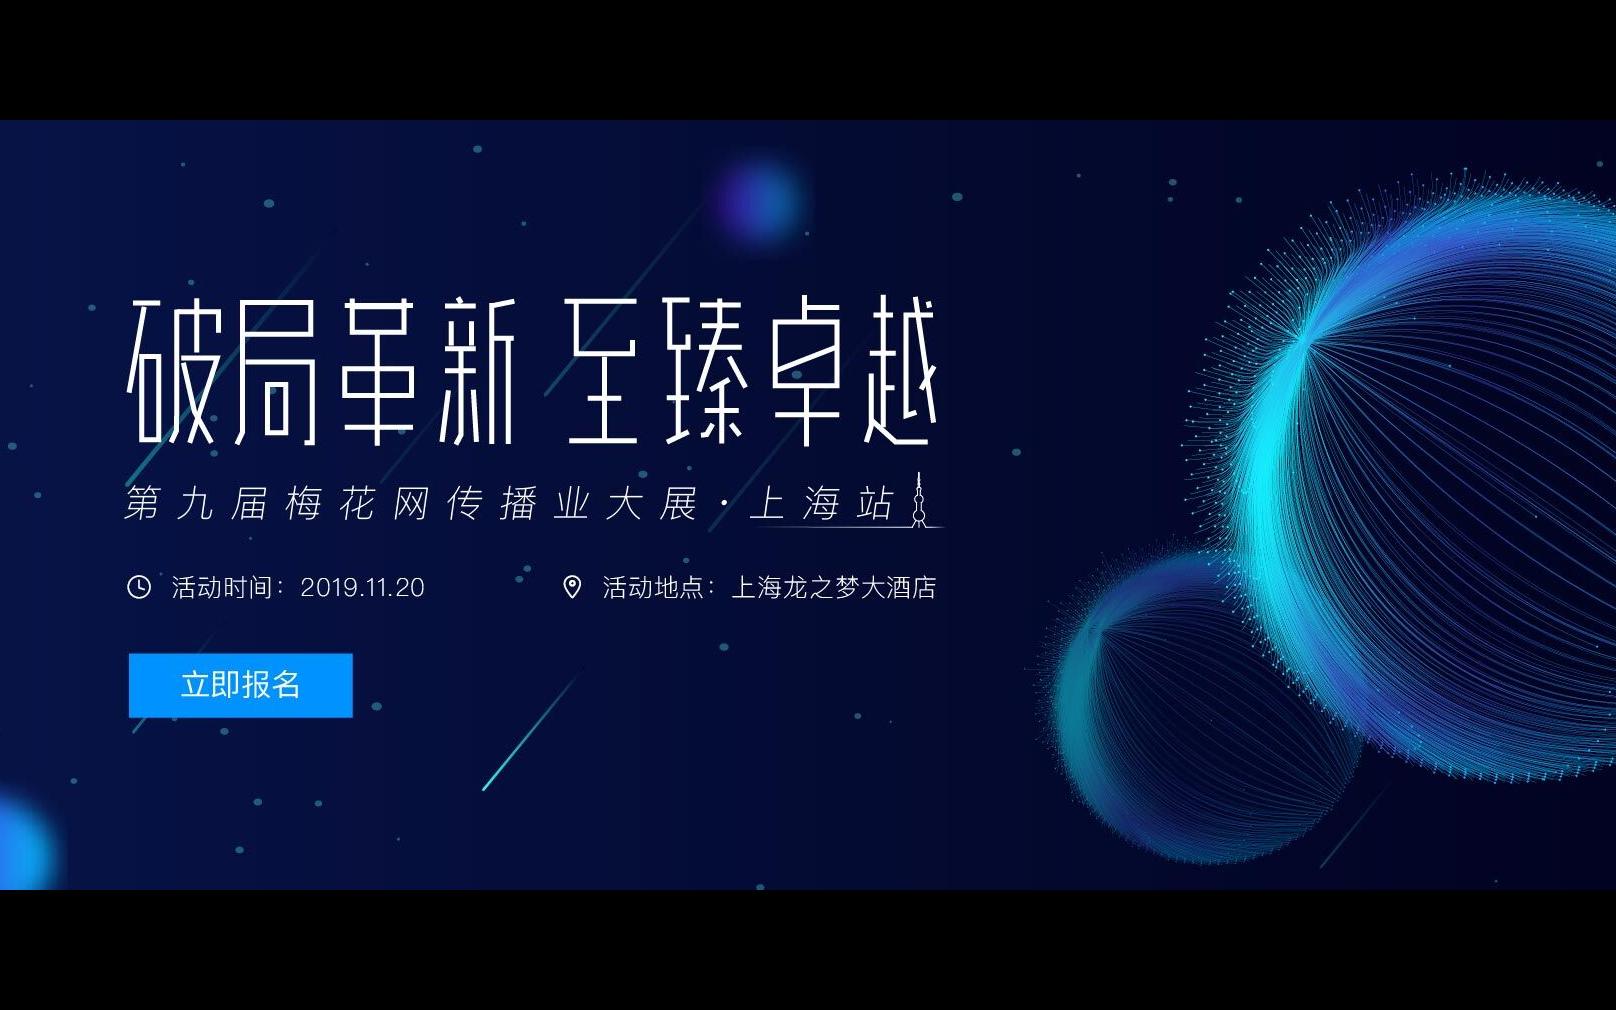 MEXPO2019梅花网传播业大展上海站